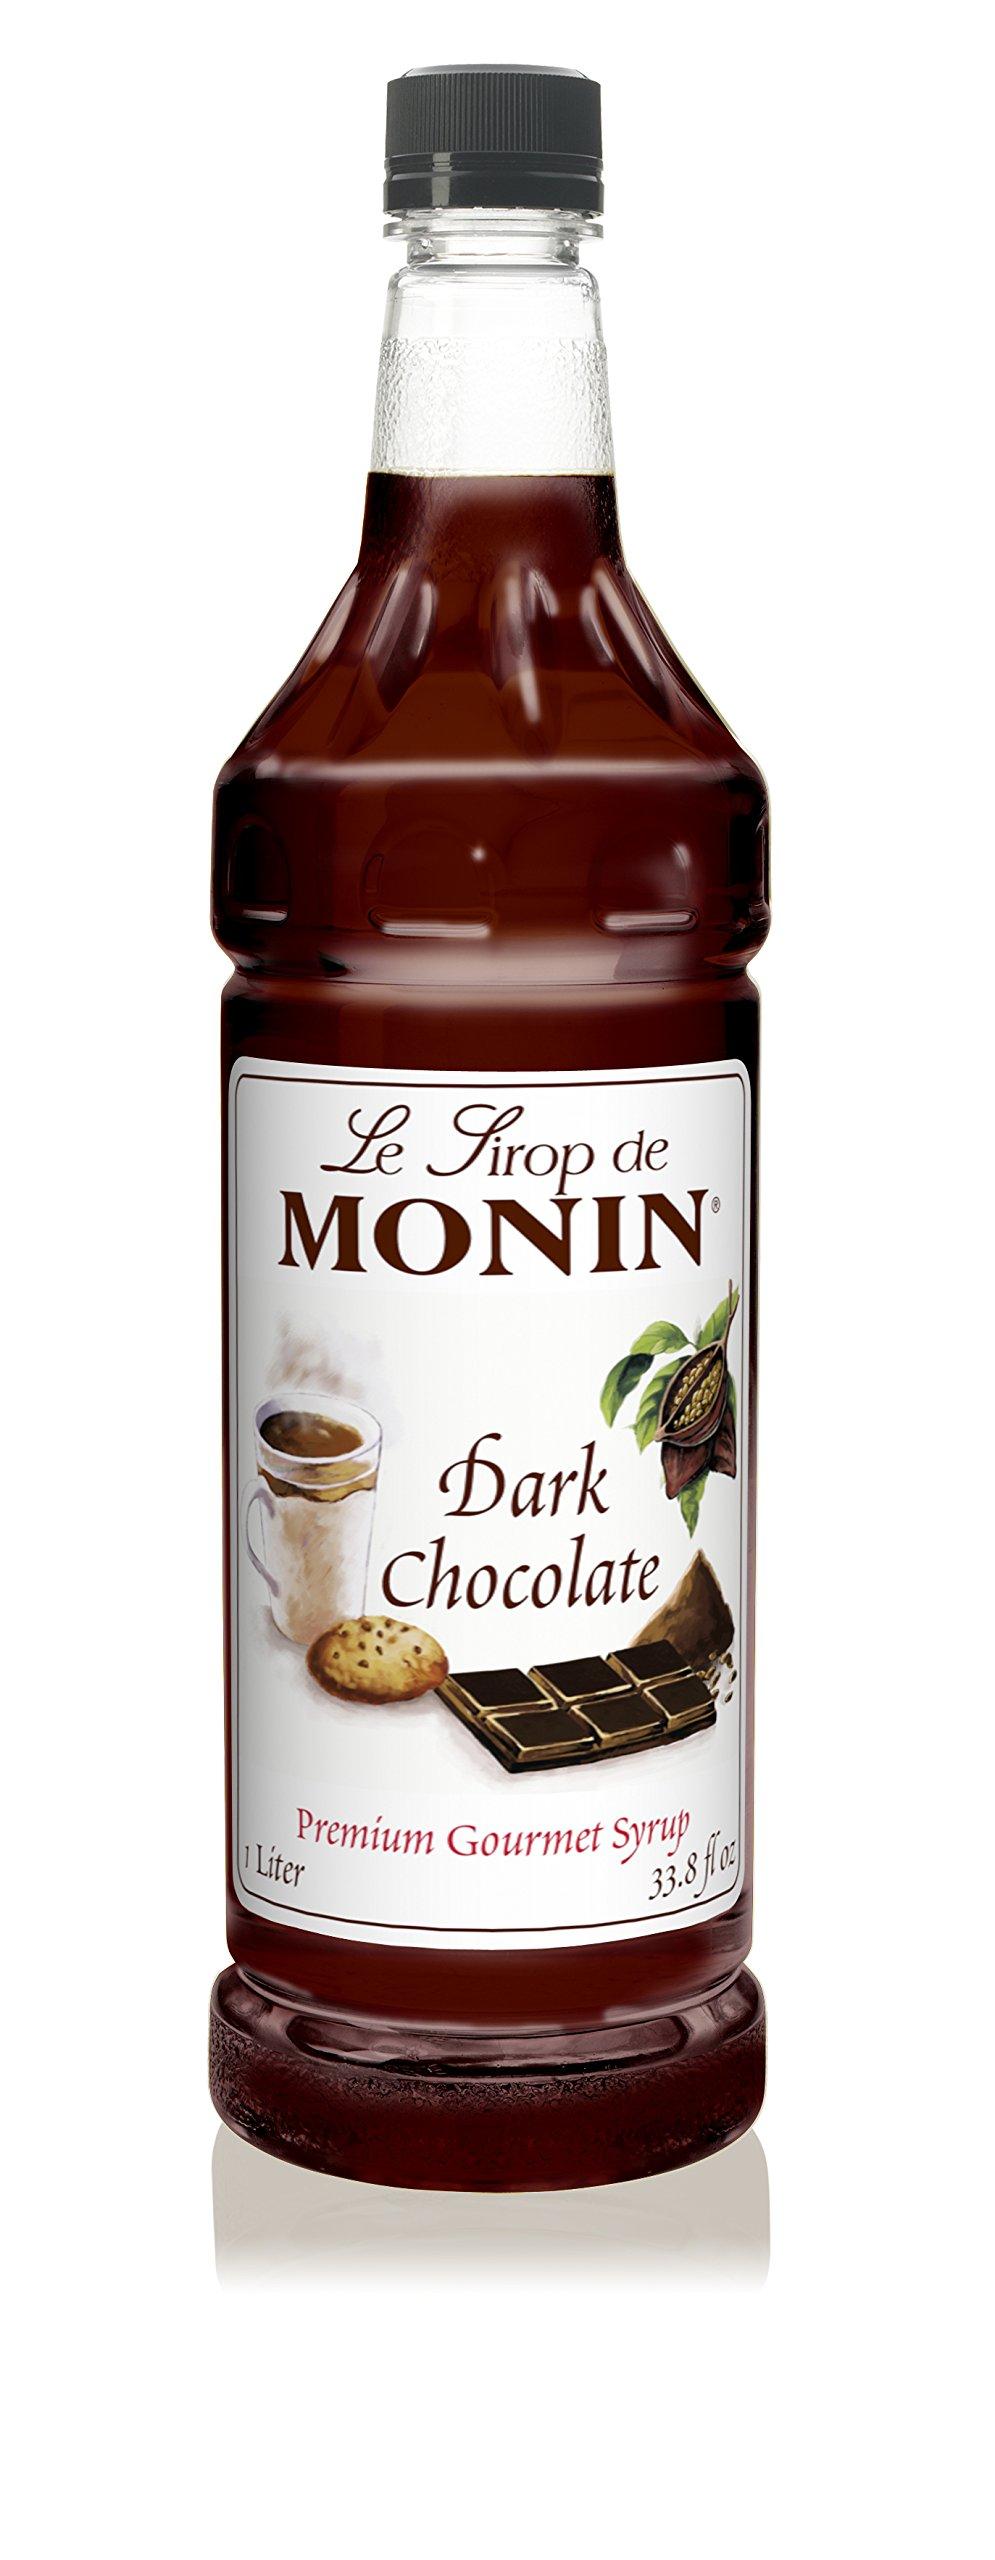 Monin - Dark Chocolate Syrup, Rich Cocoa Flavor, Great for Lattes, Mochas, Smoothies, & Shakes, Vegan, Non-GMO, Gluten-Free (1 Liter)